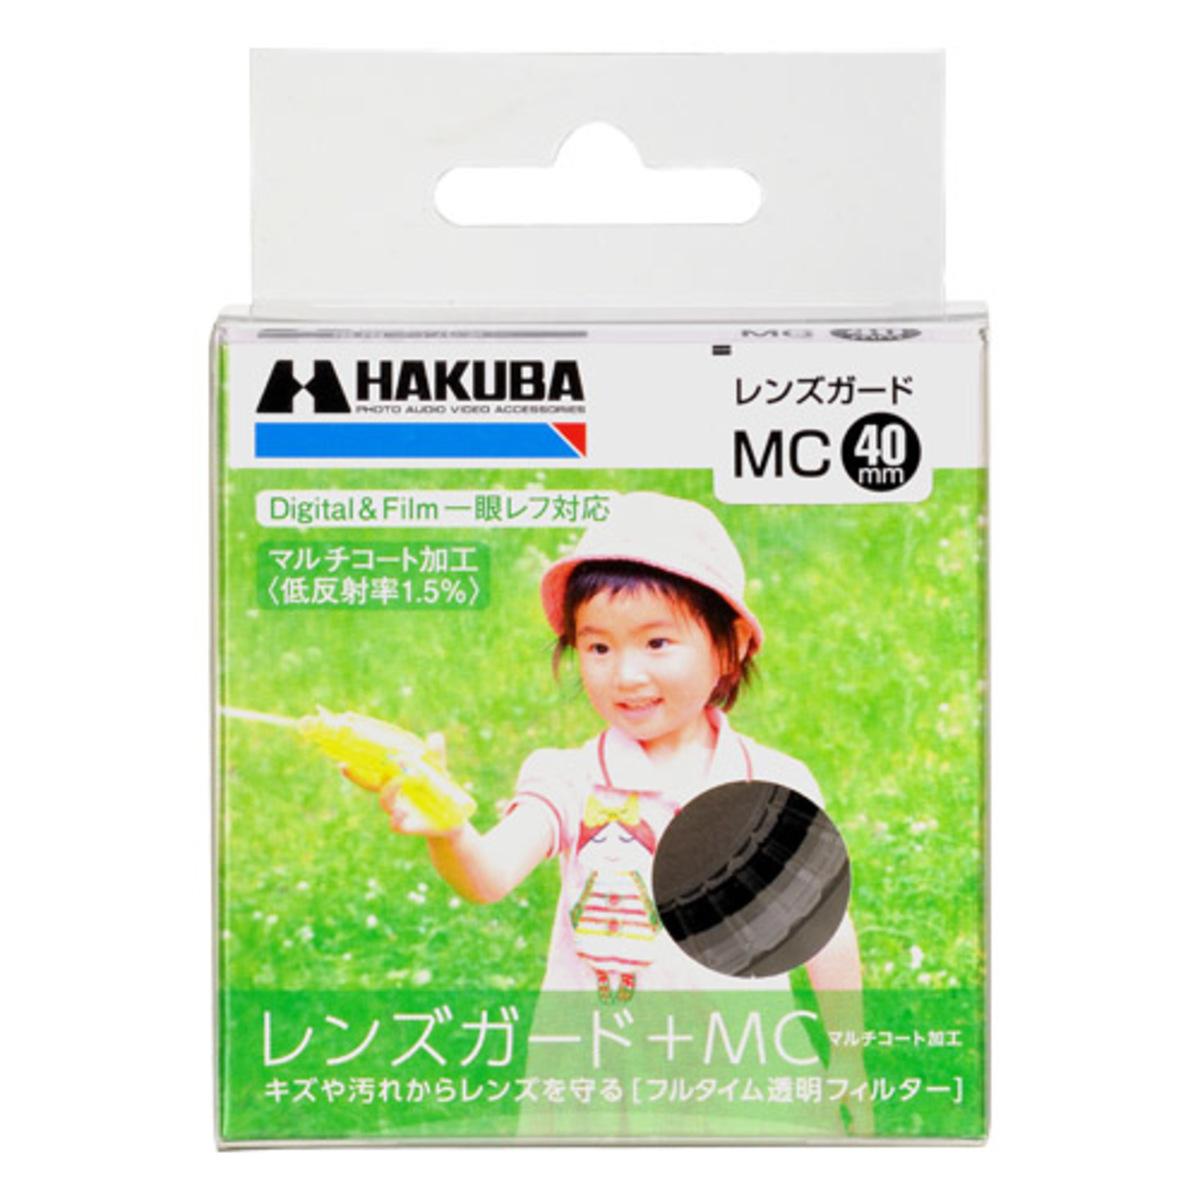 MC UV Protector 77mm Filter 鏡頭保護鏡